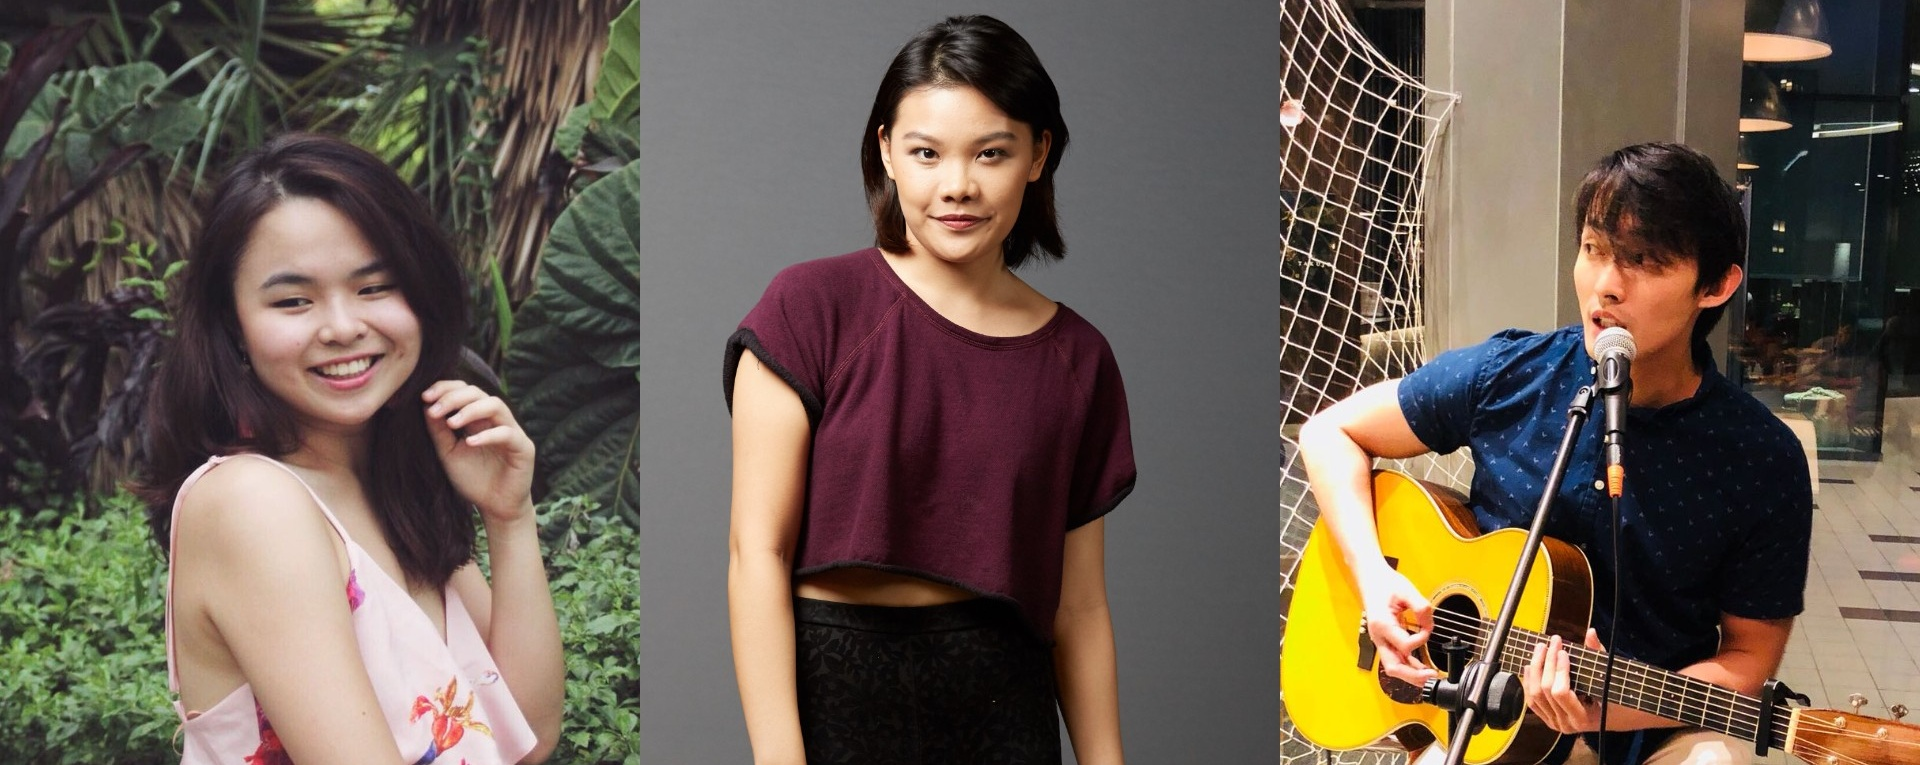 Our Singapore Dreams by Alyssa Lie, Nicholas Loo & Louisa Vilinne